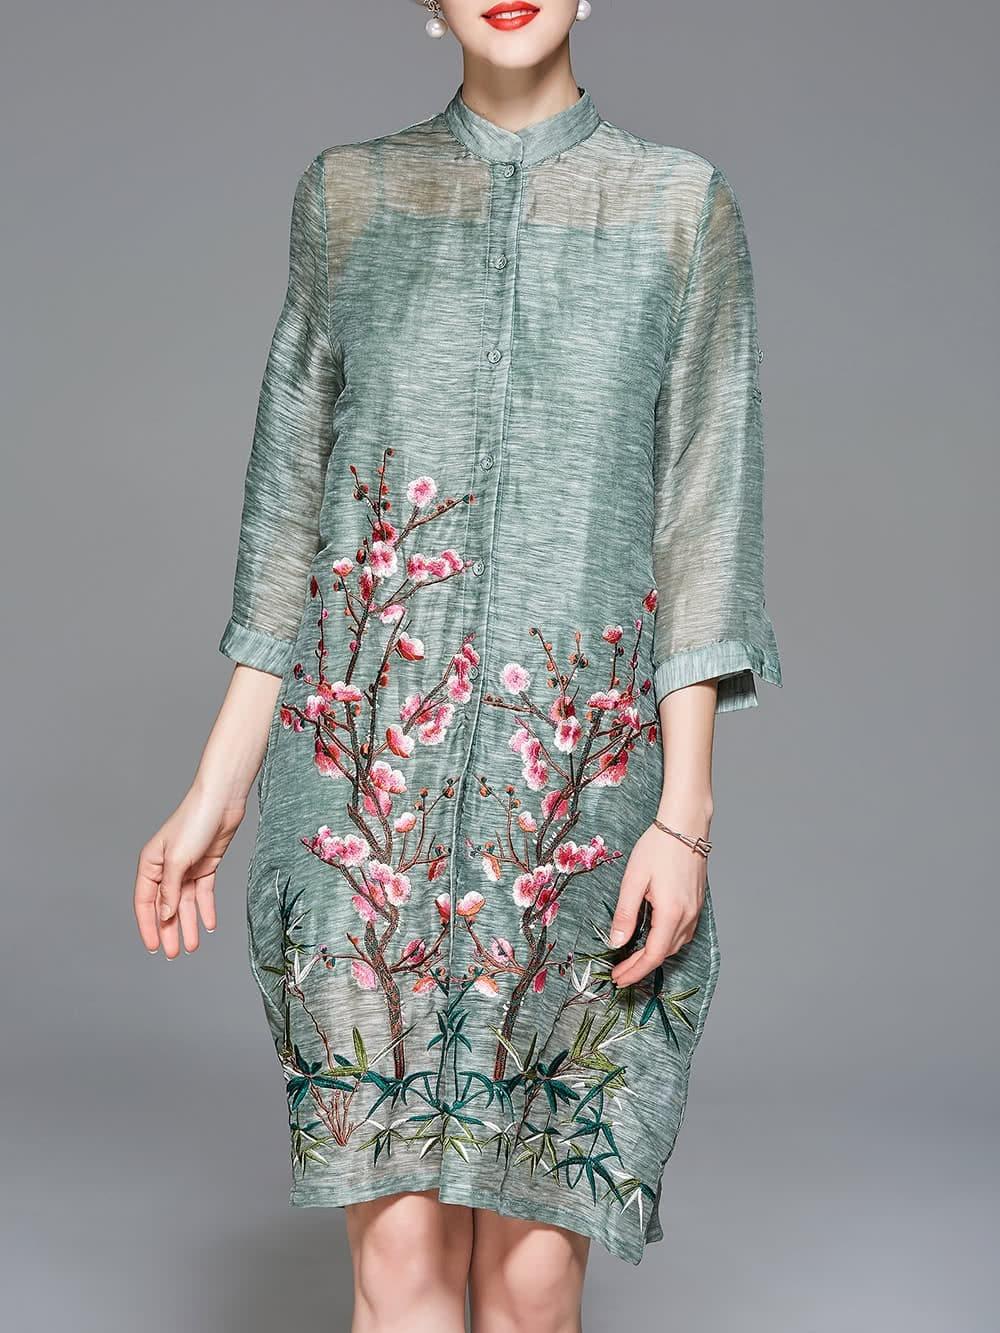 Flowers embroidered pockets vintage dress shein sheinside